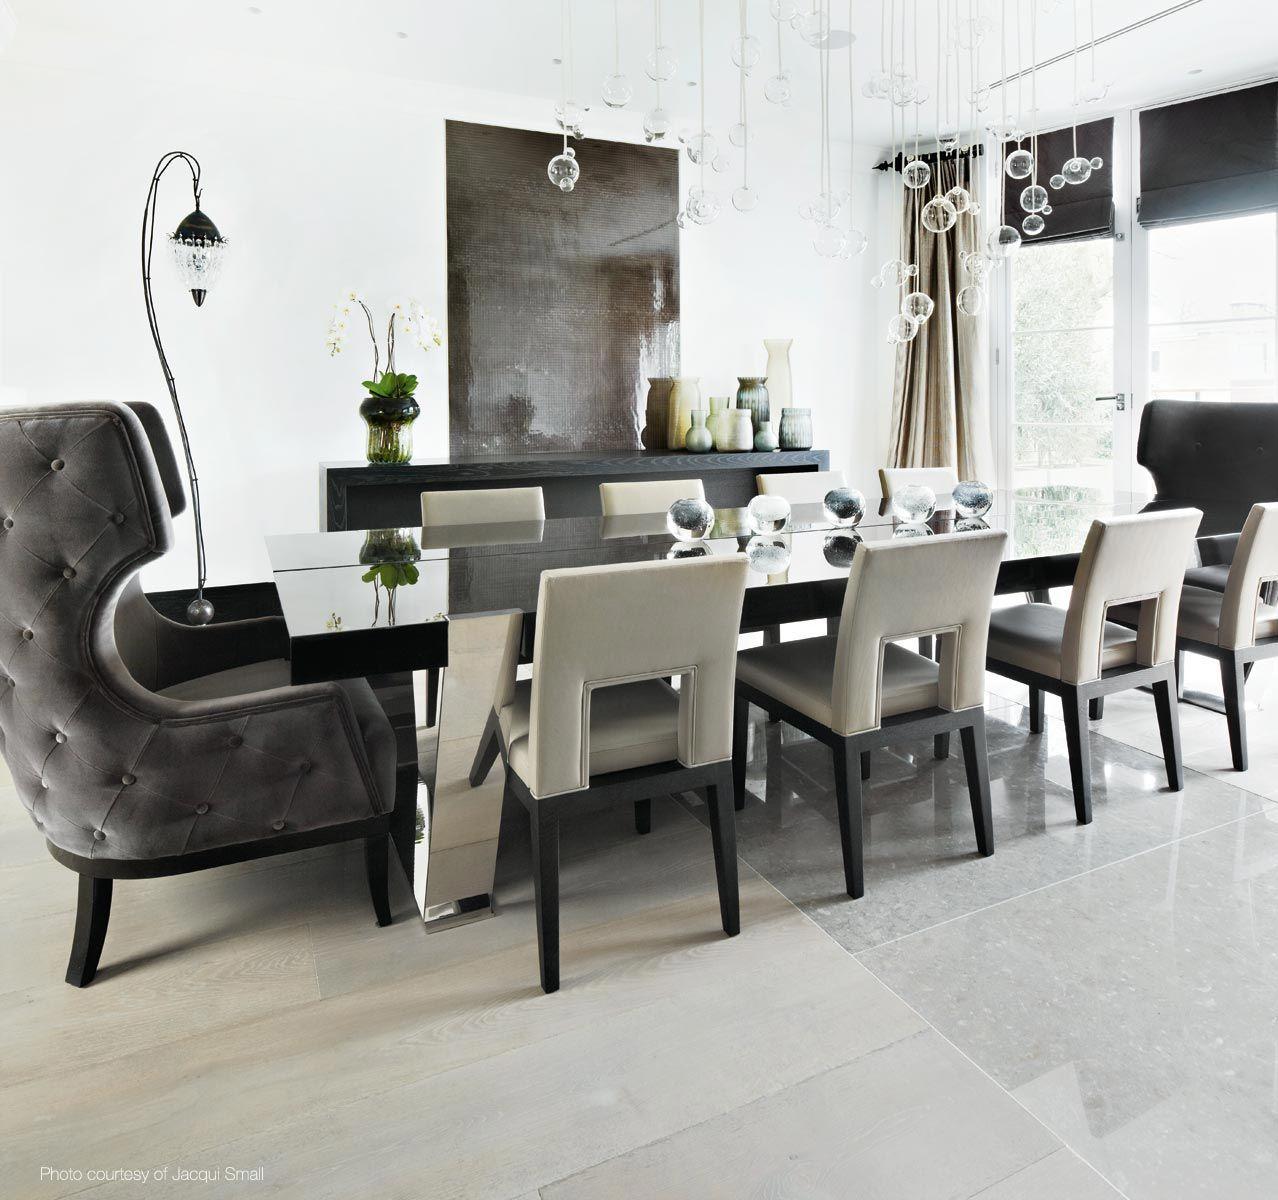 Kelly Pereira Design Studio Kitchen Inspirations: Top Interior Designer - Kelly Hoppen